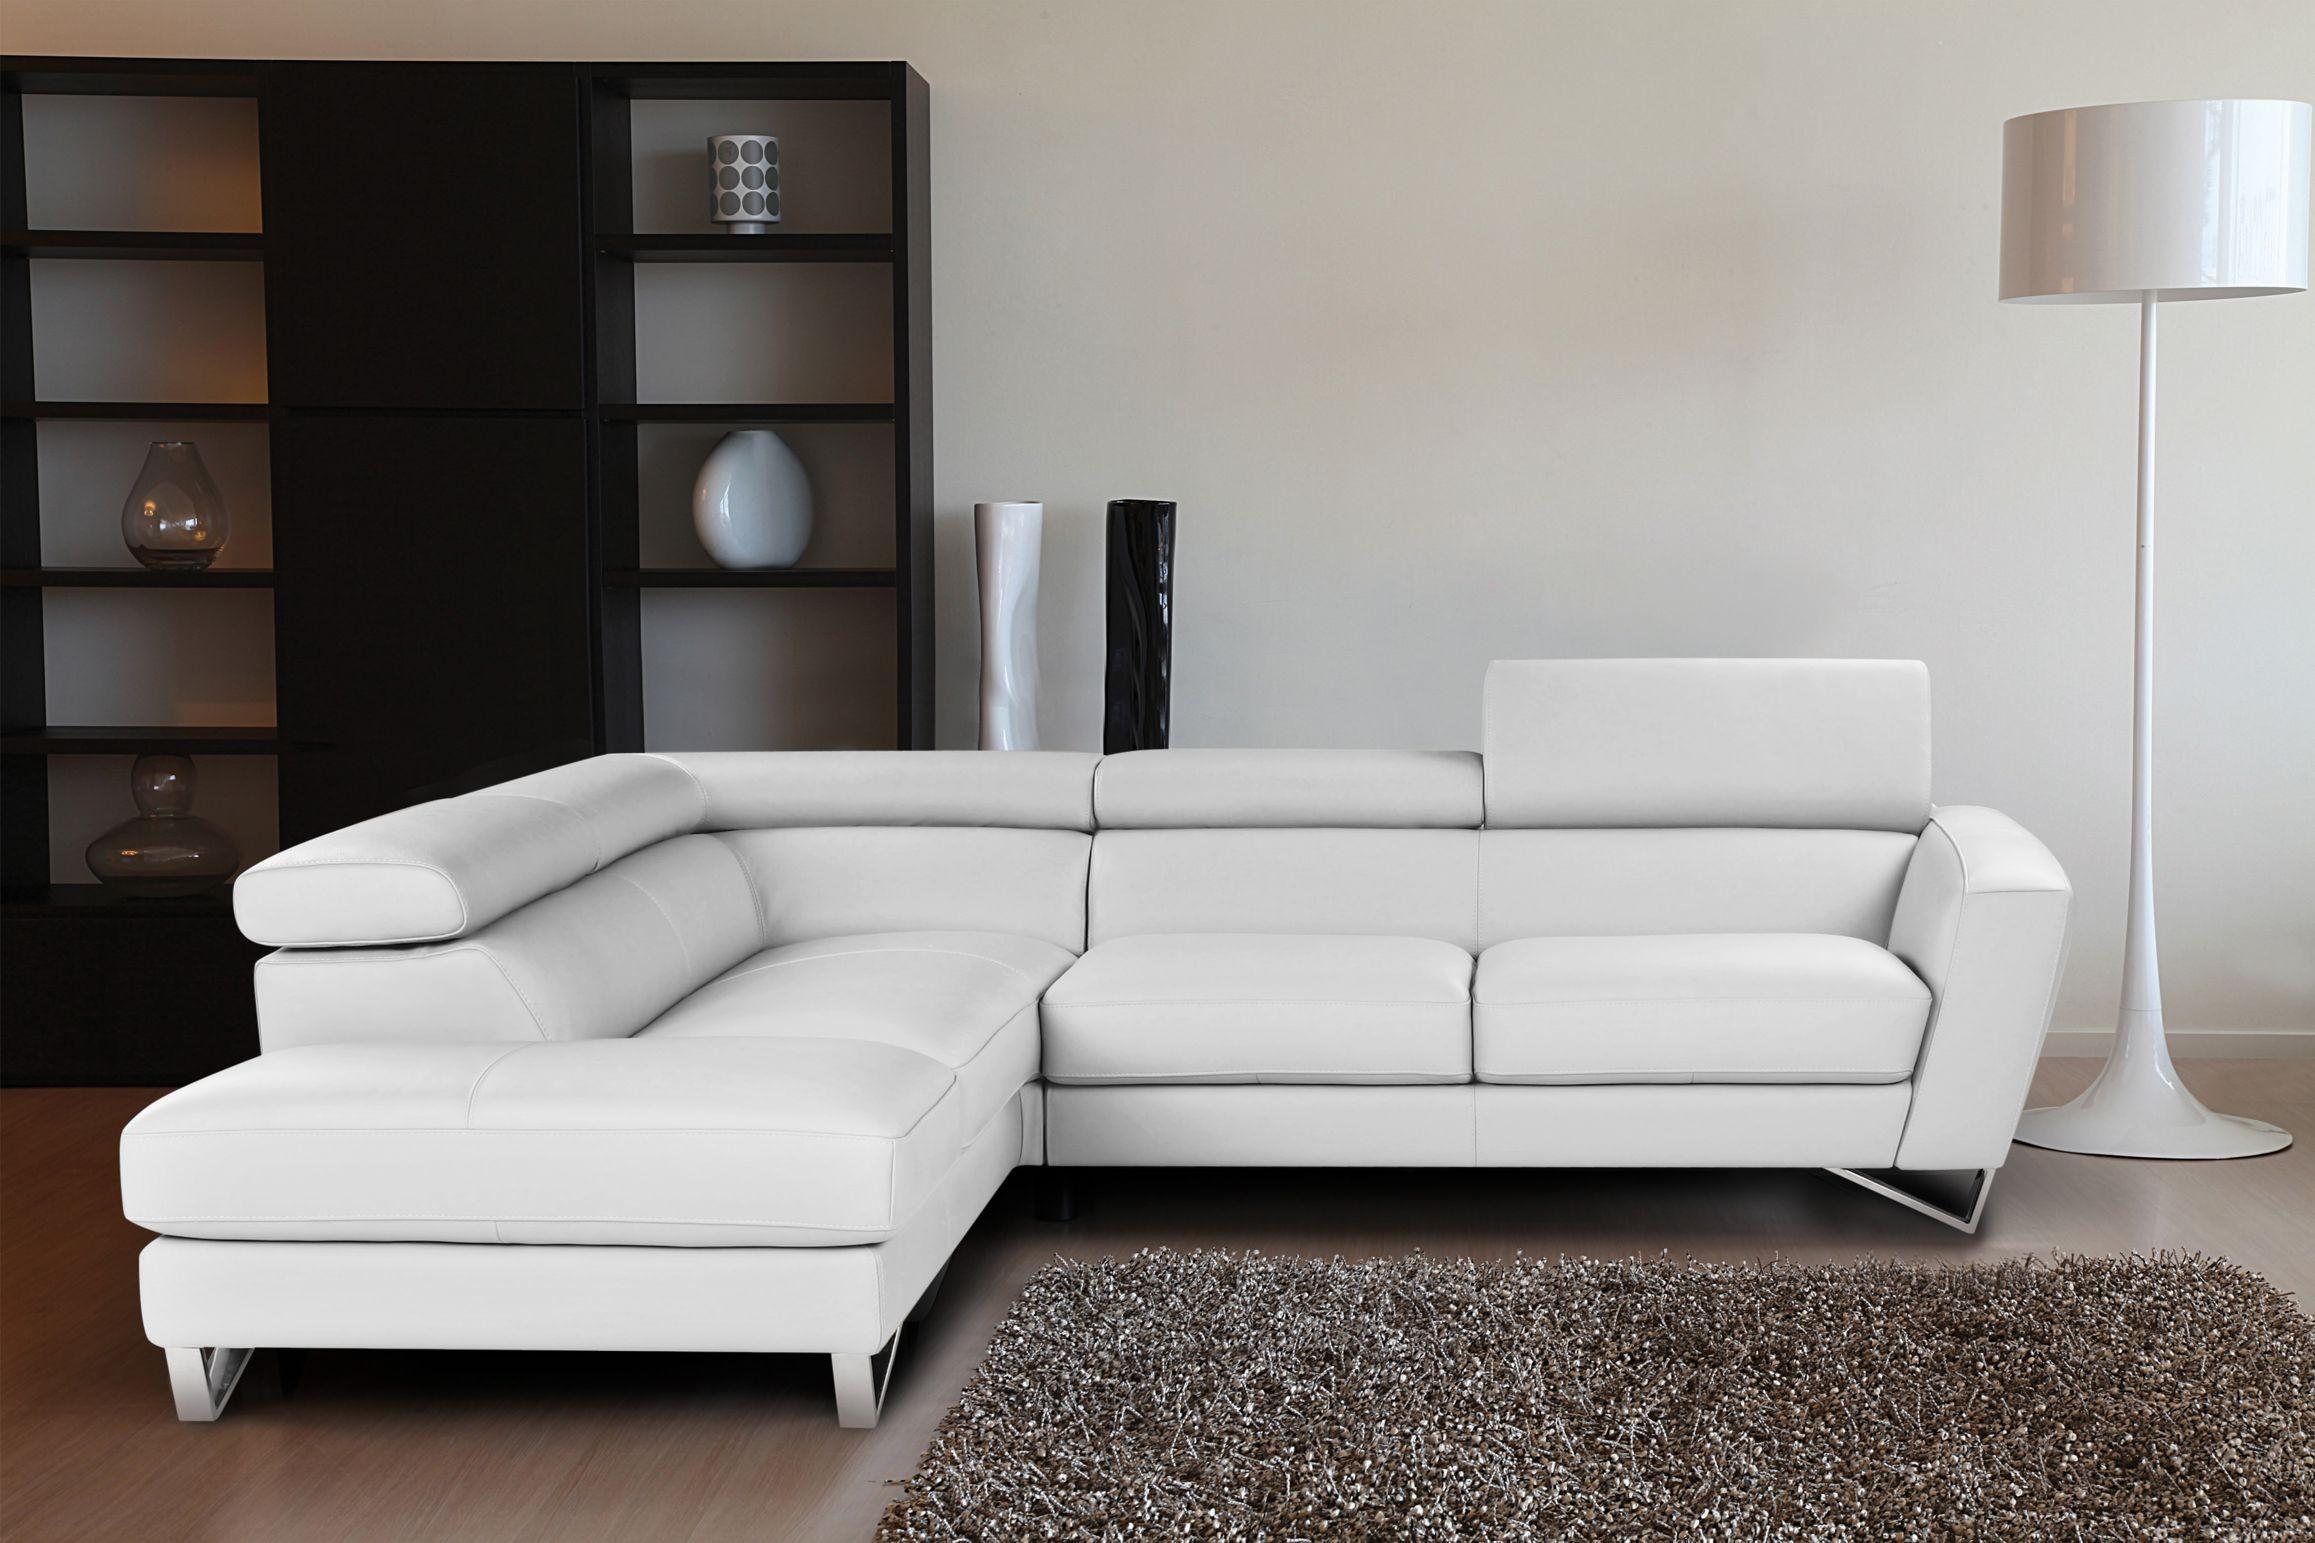 Sparta Italian Leather Modern Sectional Sofa With Regard To Leather Modern Sectional Sofas (Image 17 of 20)